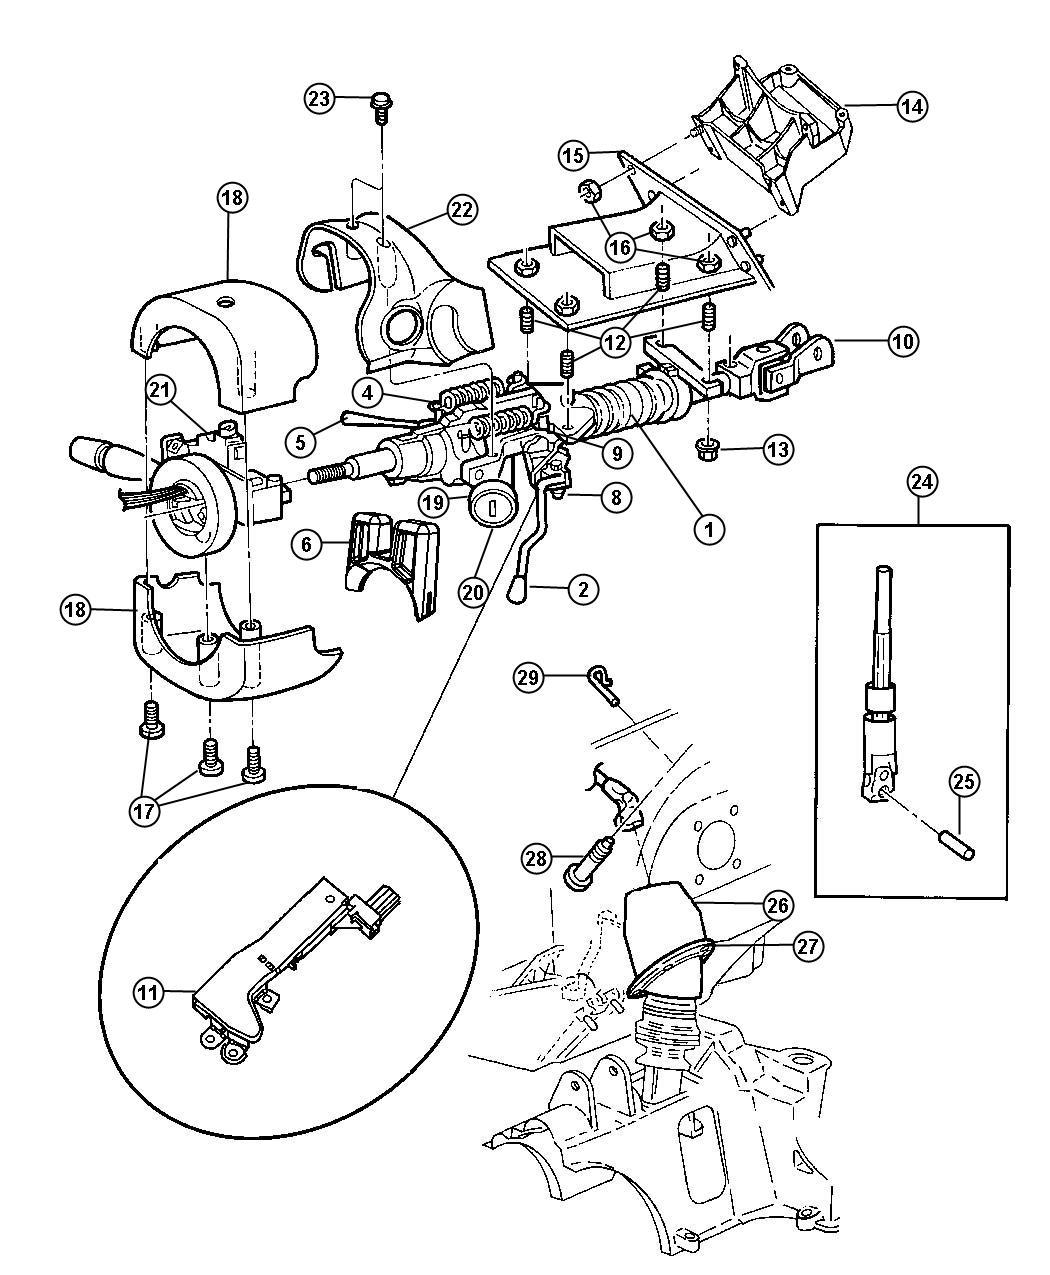 [DIAGRAM] Corvette Steering Column Diagram FULL Version HD